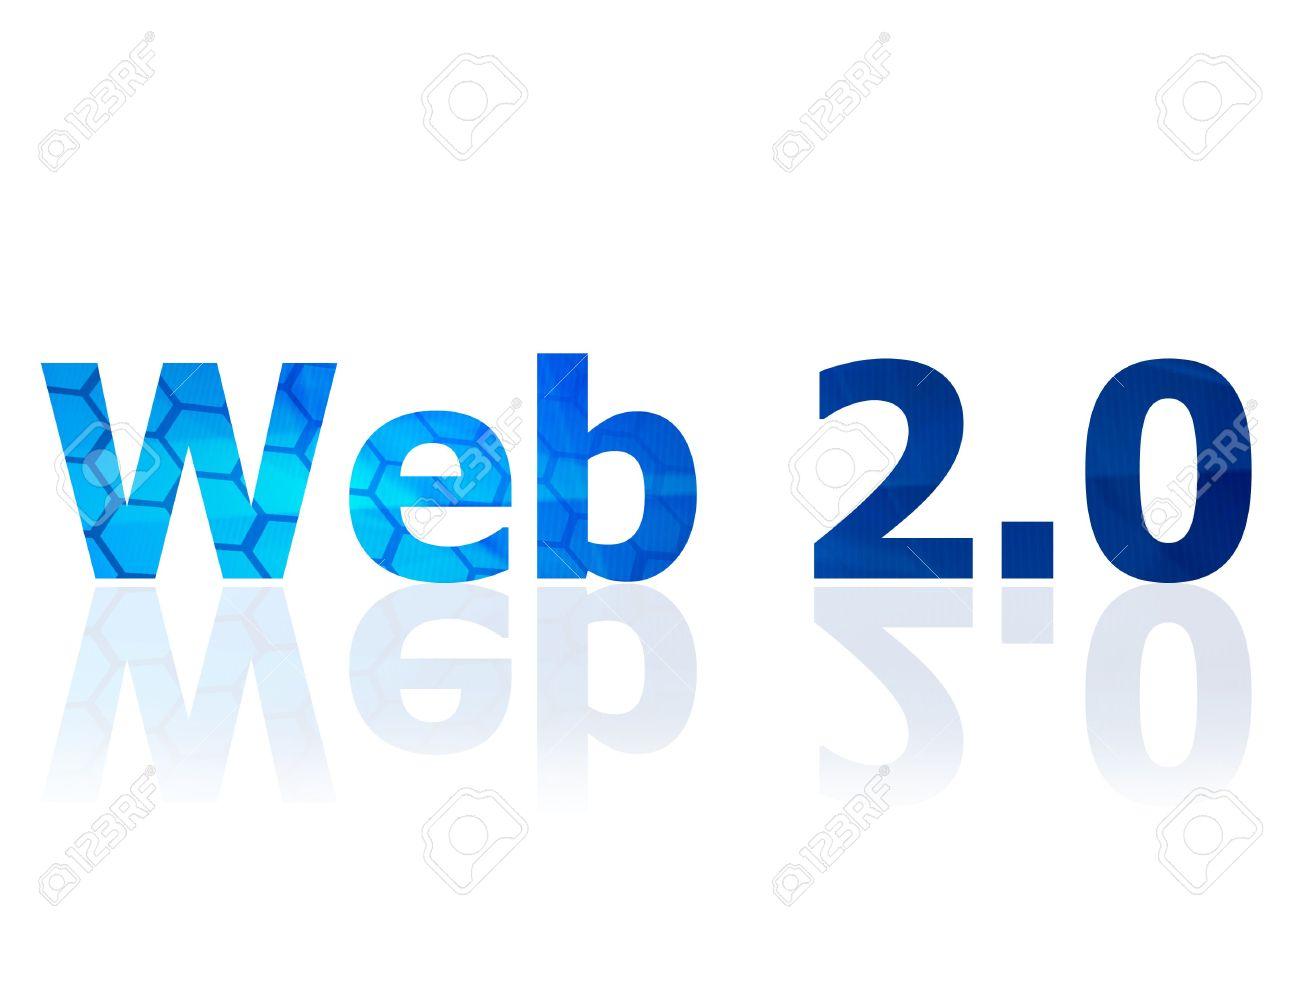 I will create 10 web 2.0 seo services 30+ domain authority